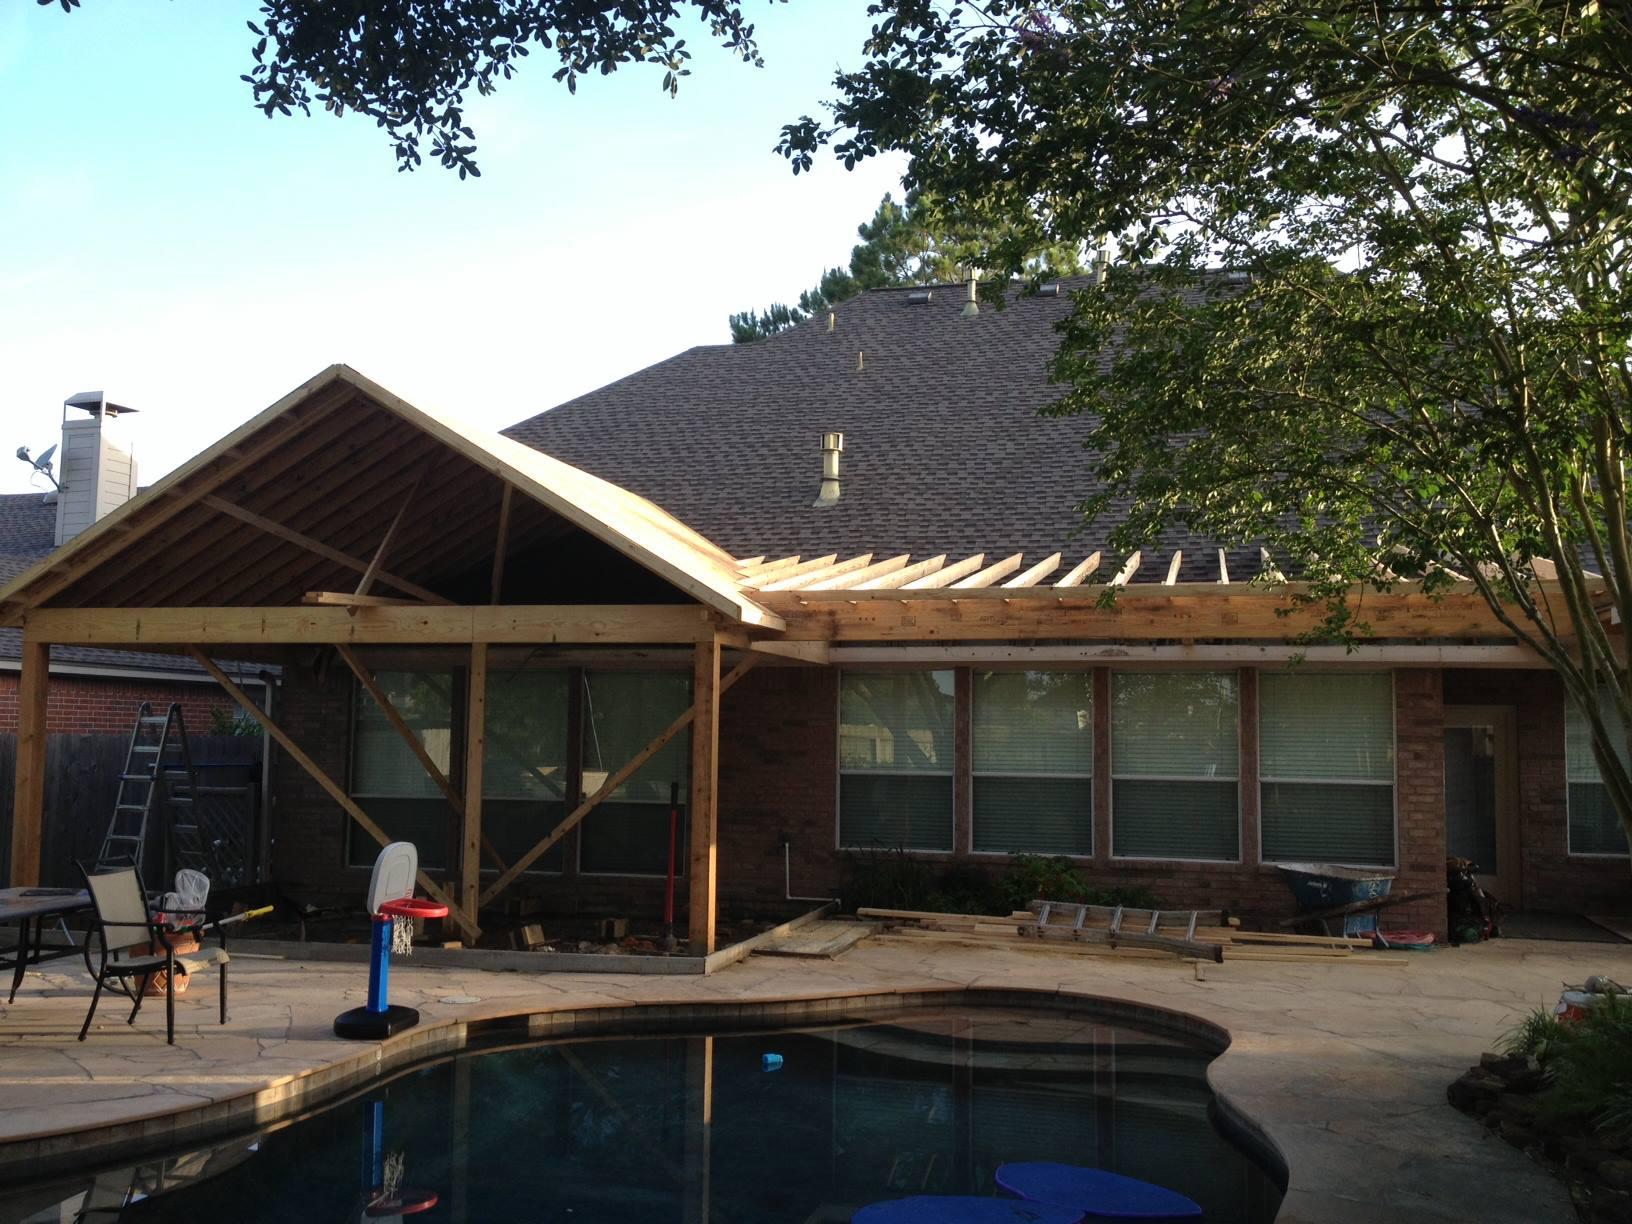 Picketts Swimming Pool Katy Texas Pool Builder Sahara